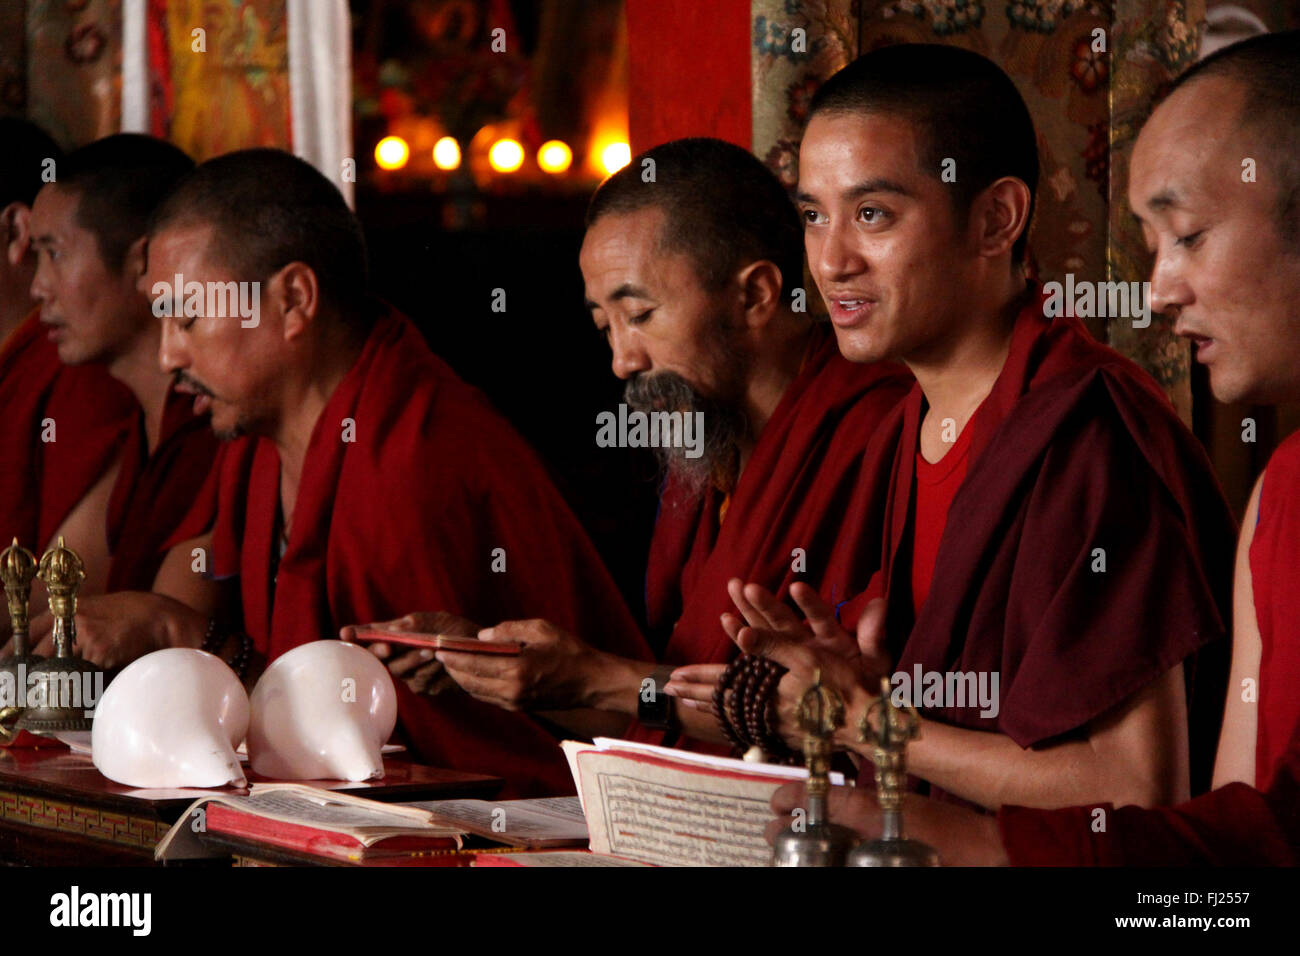 Retrato del monje budista en Nepal Foto de stock